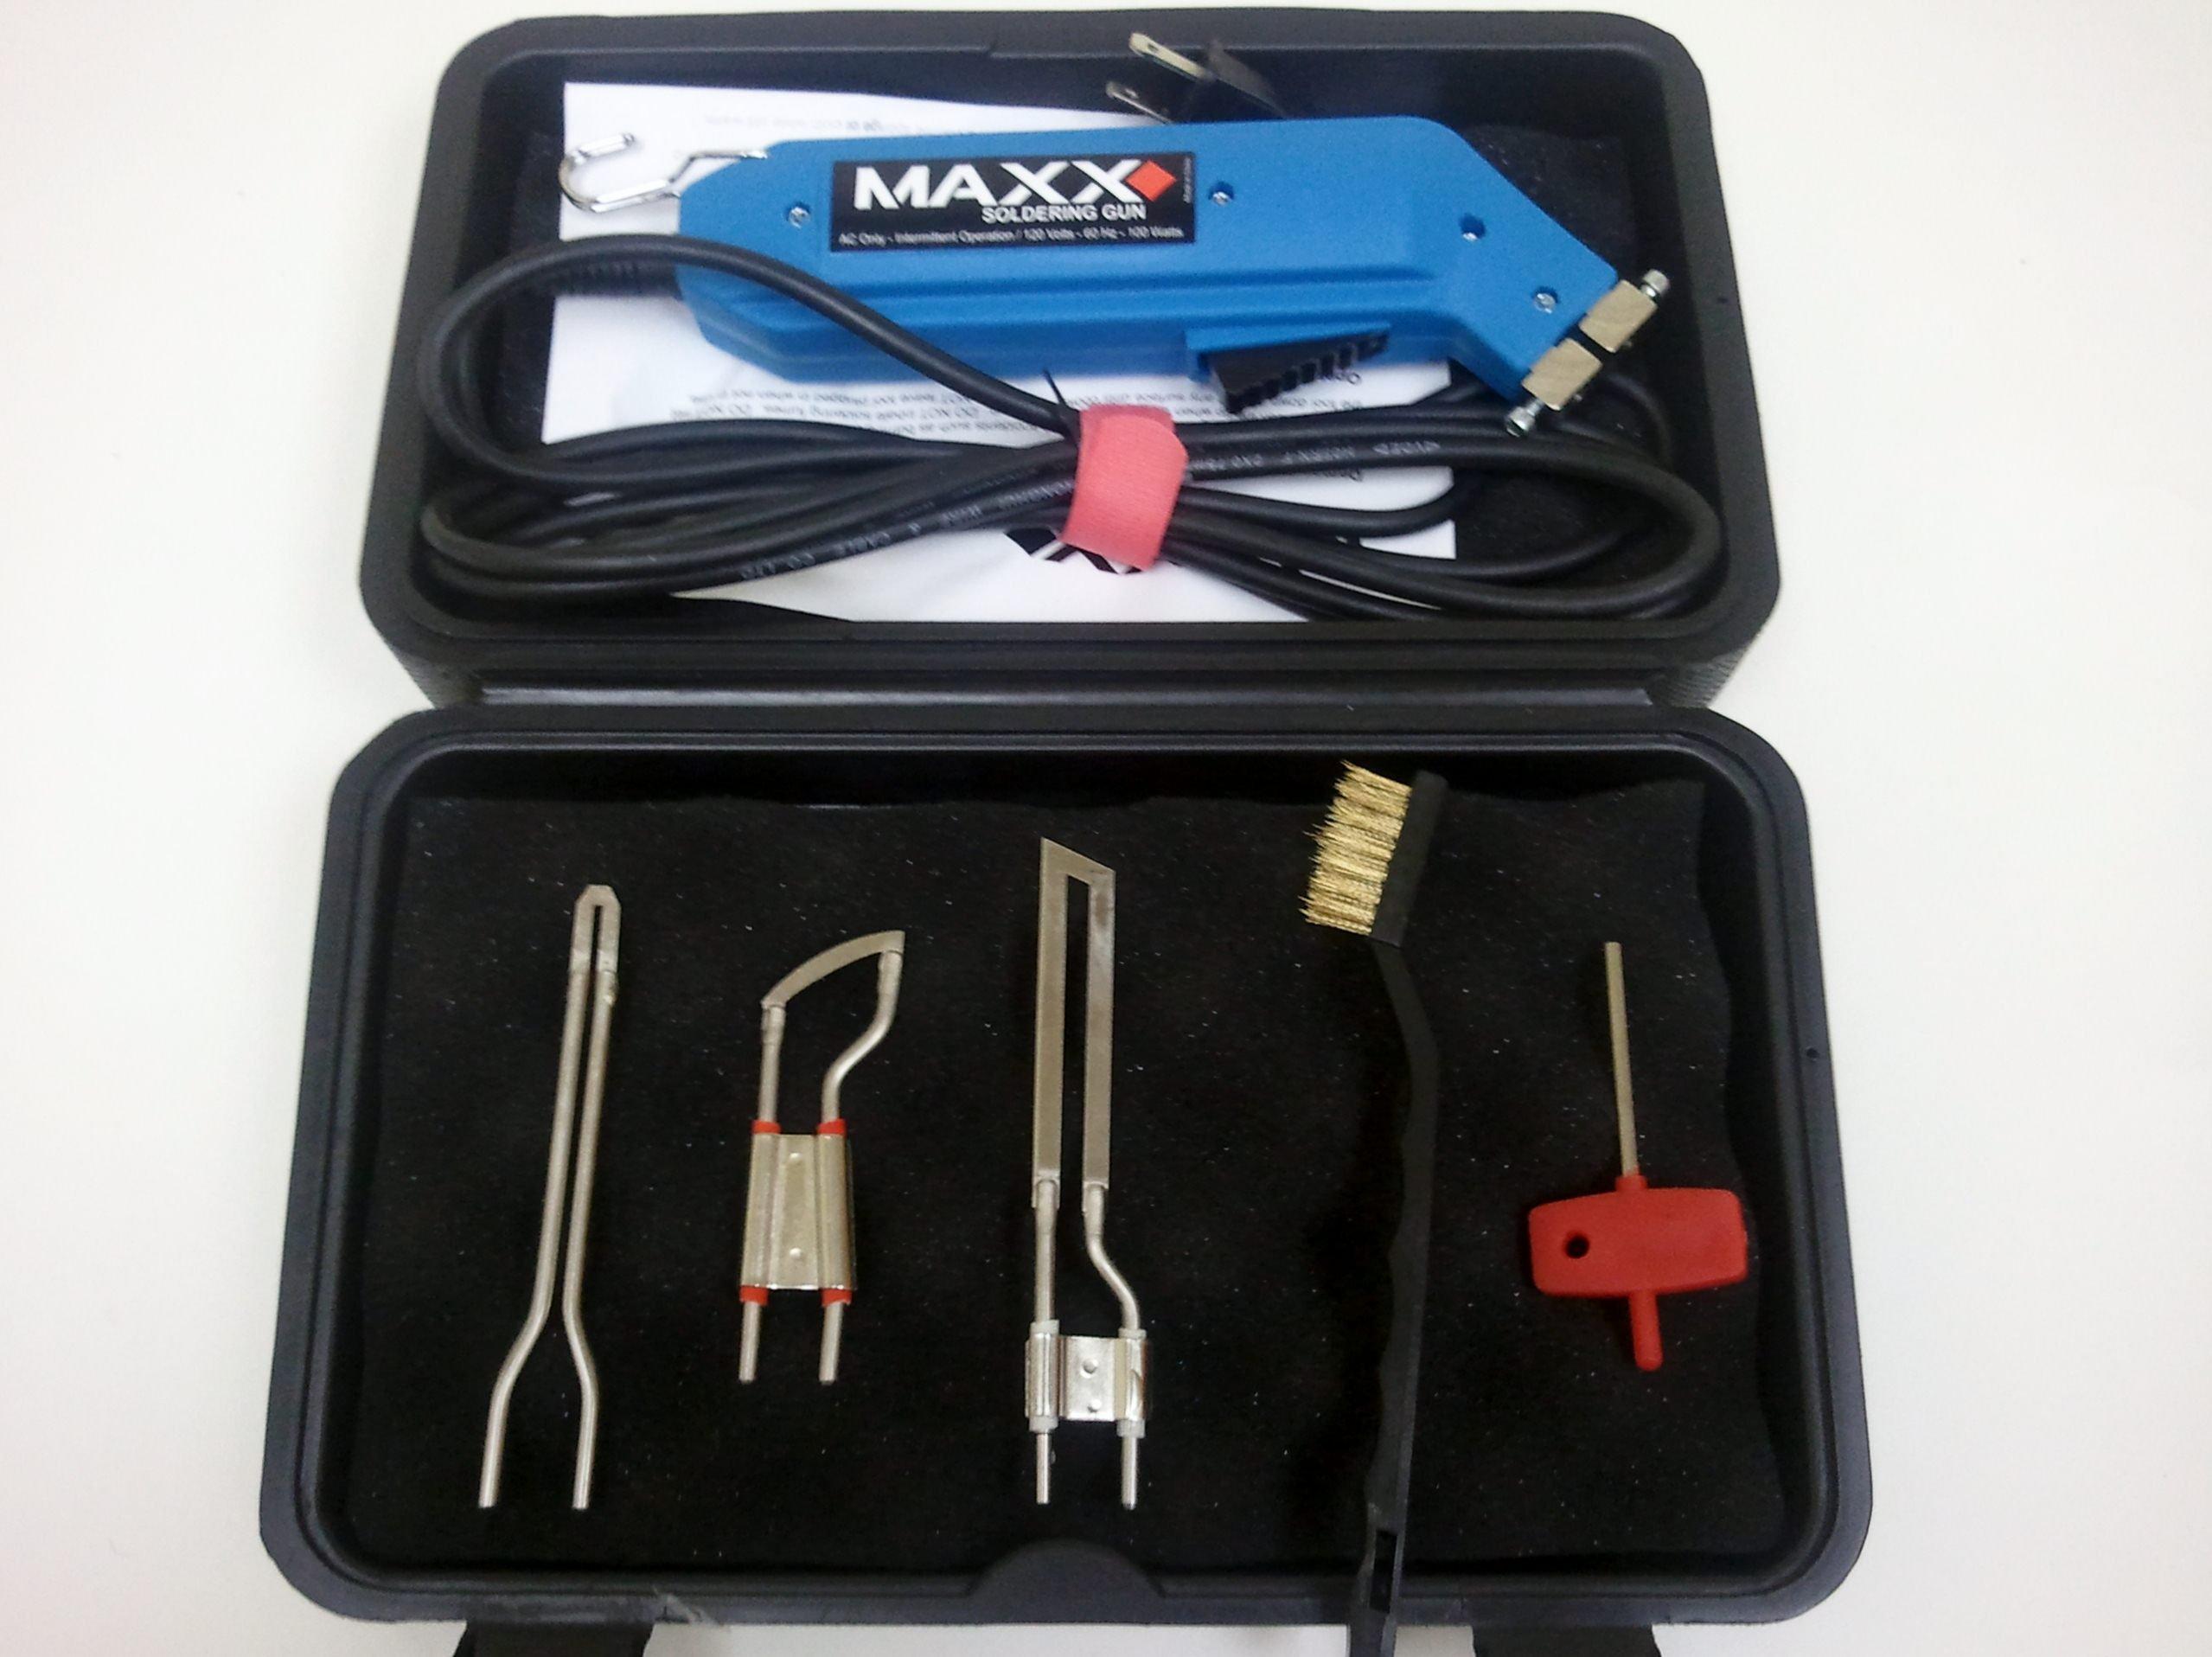 Maxx 3 in 1 Hot Knife Kit, Soldering Tip, 2 1/2'' Foam Cutter & Fabric Cutter Blades